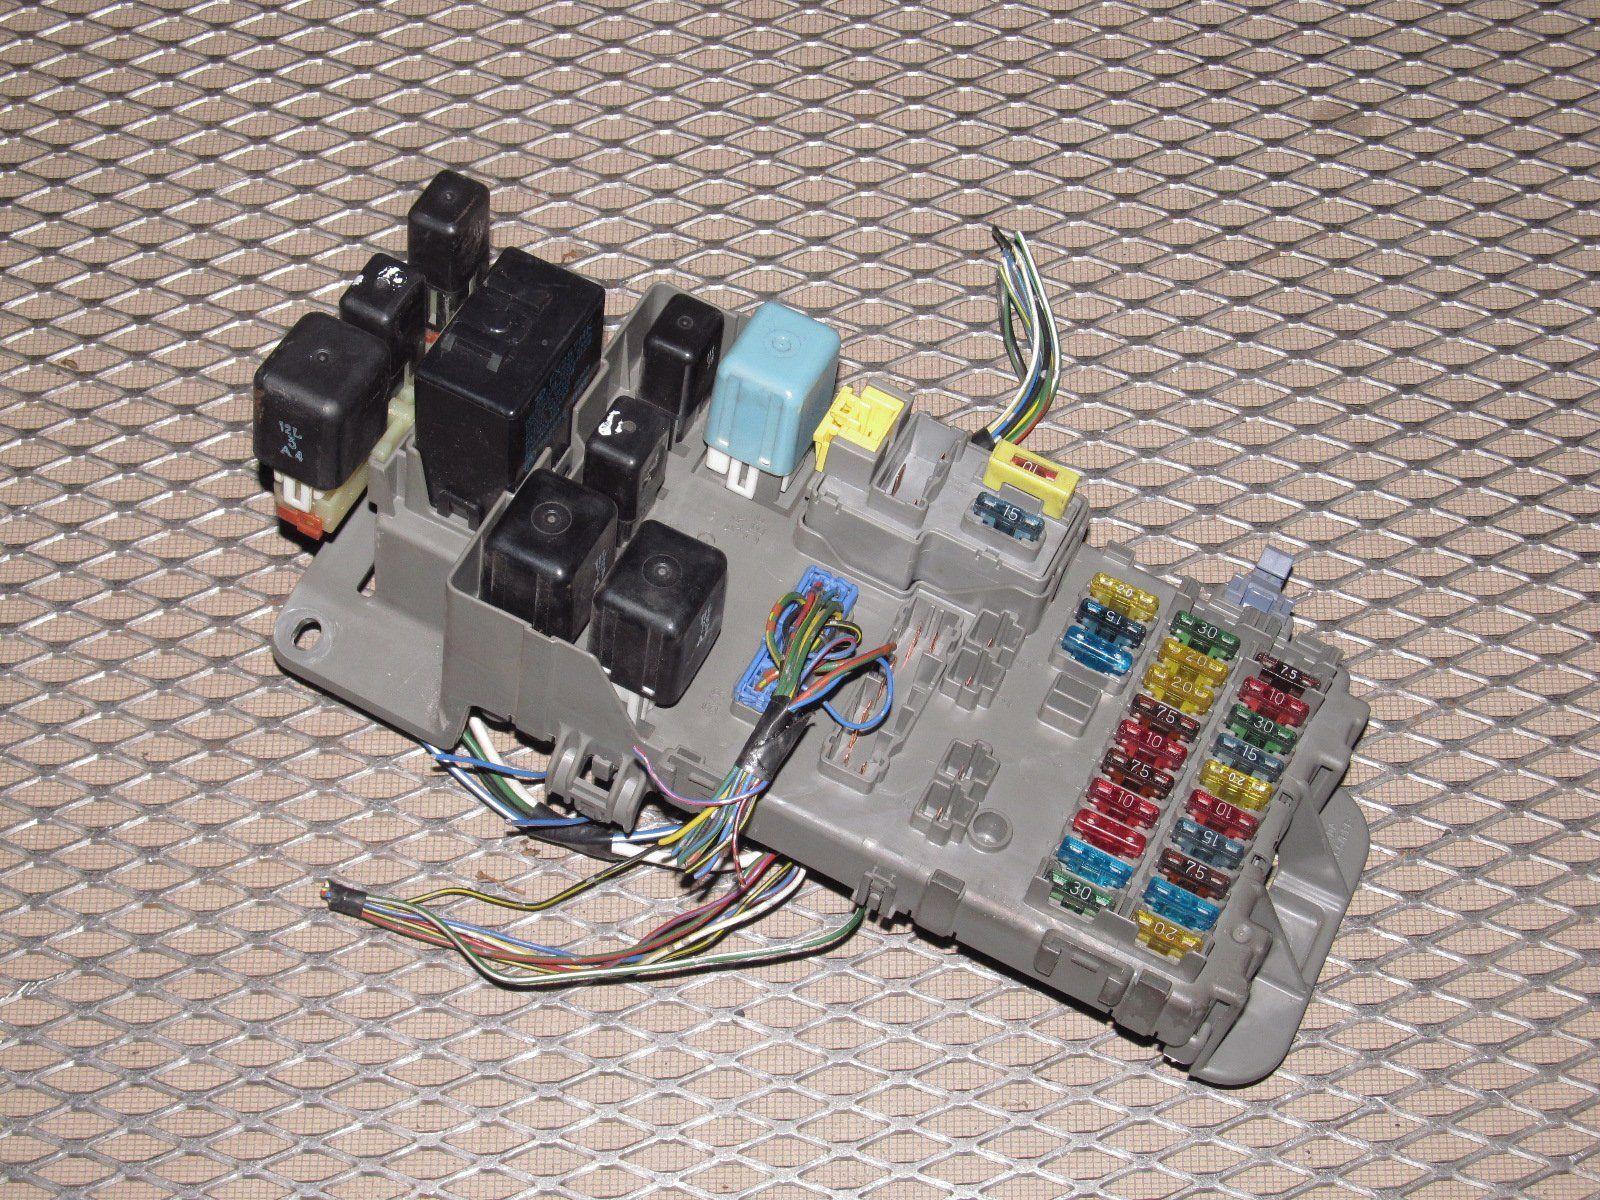 92-96 Honda Prelude OEM Interior Dash Fuse Box | Products ... on